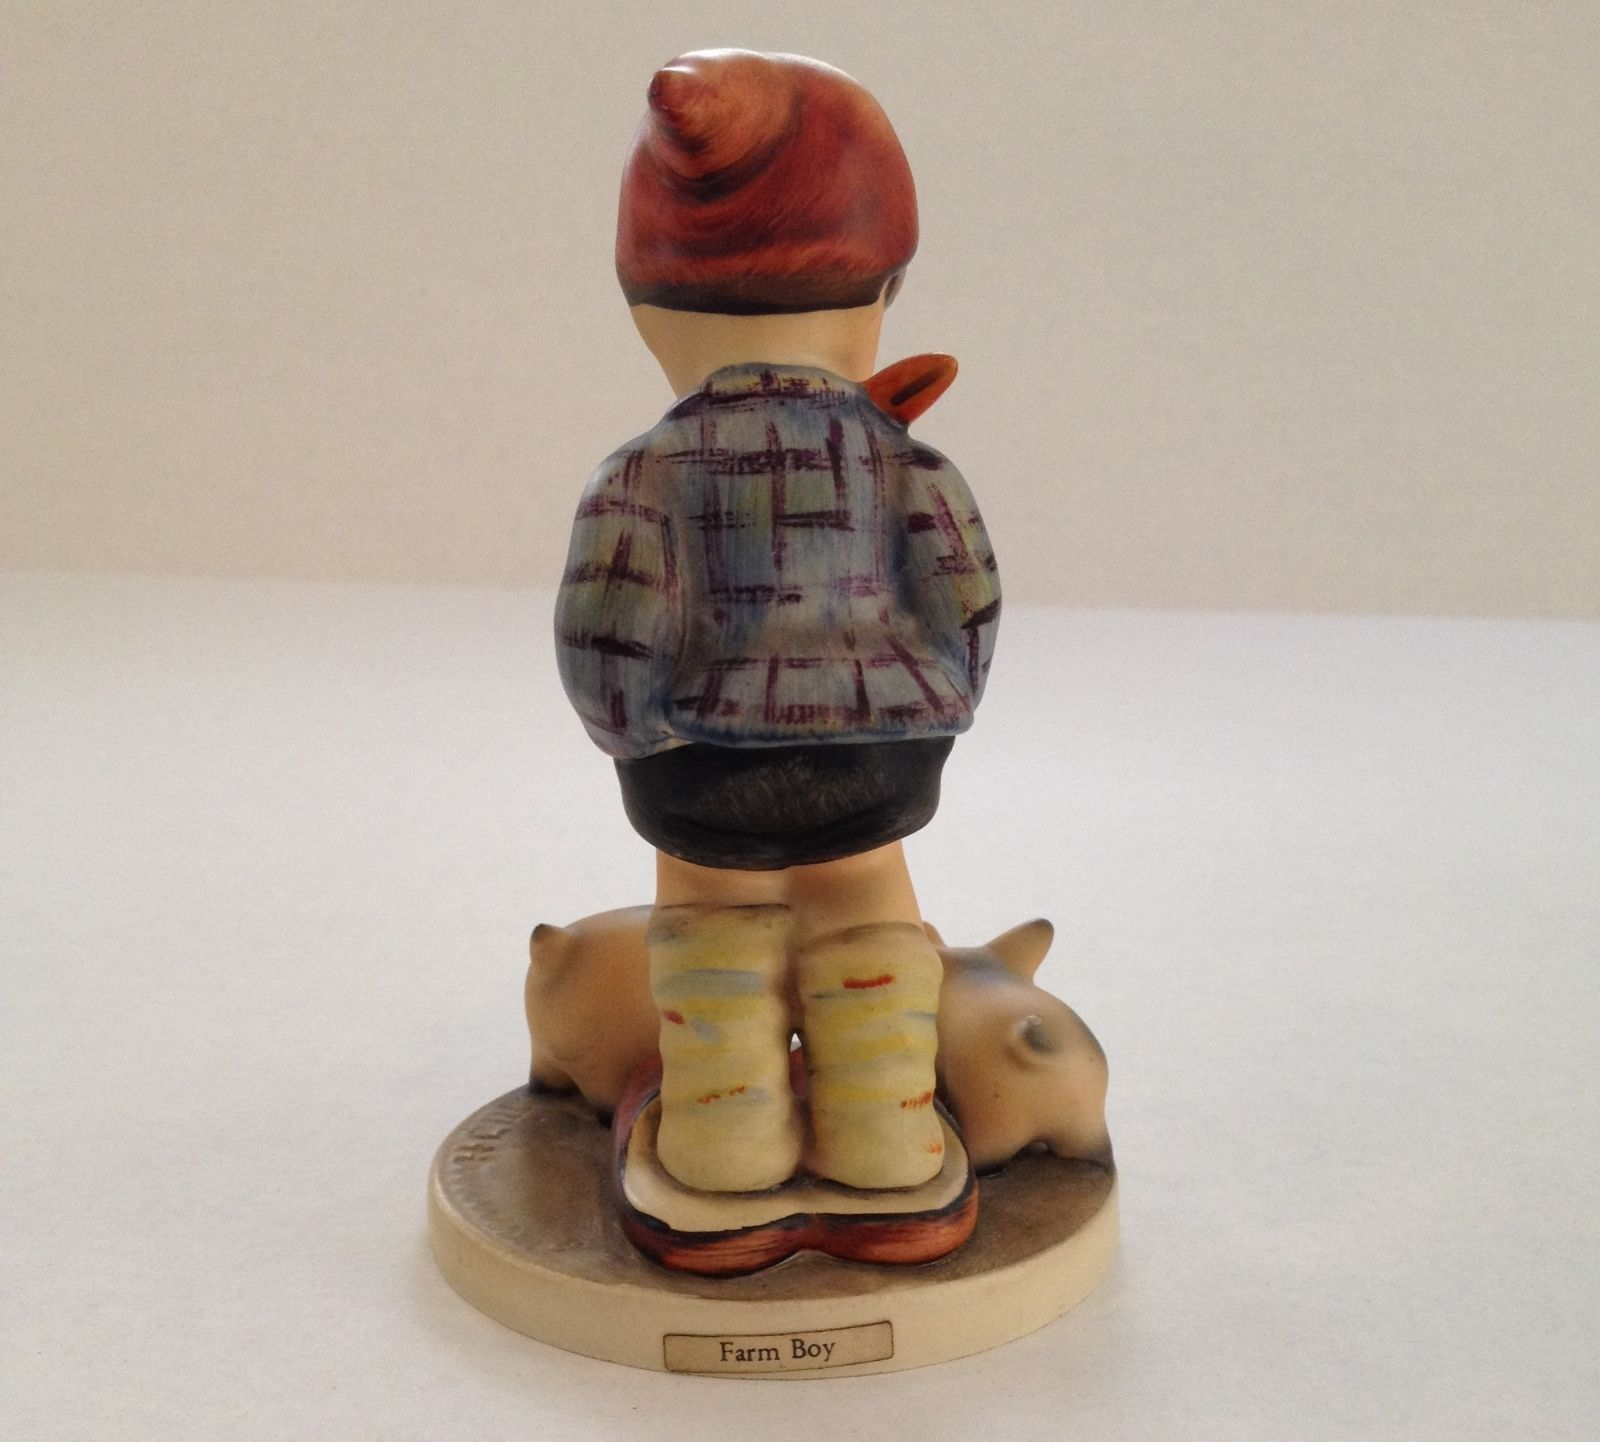 Vintage 70's Goebel Farm Boy Pig Figurine TMK5 1972-1979 #66